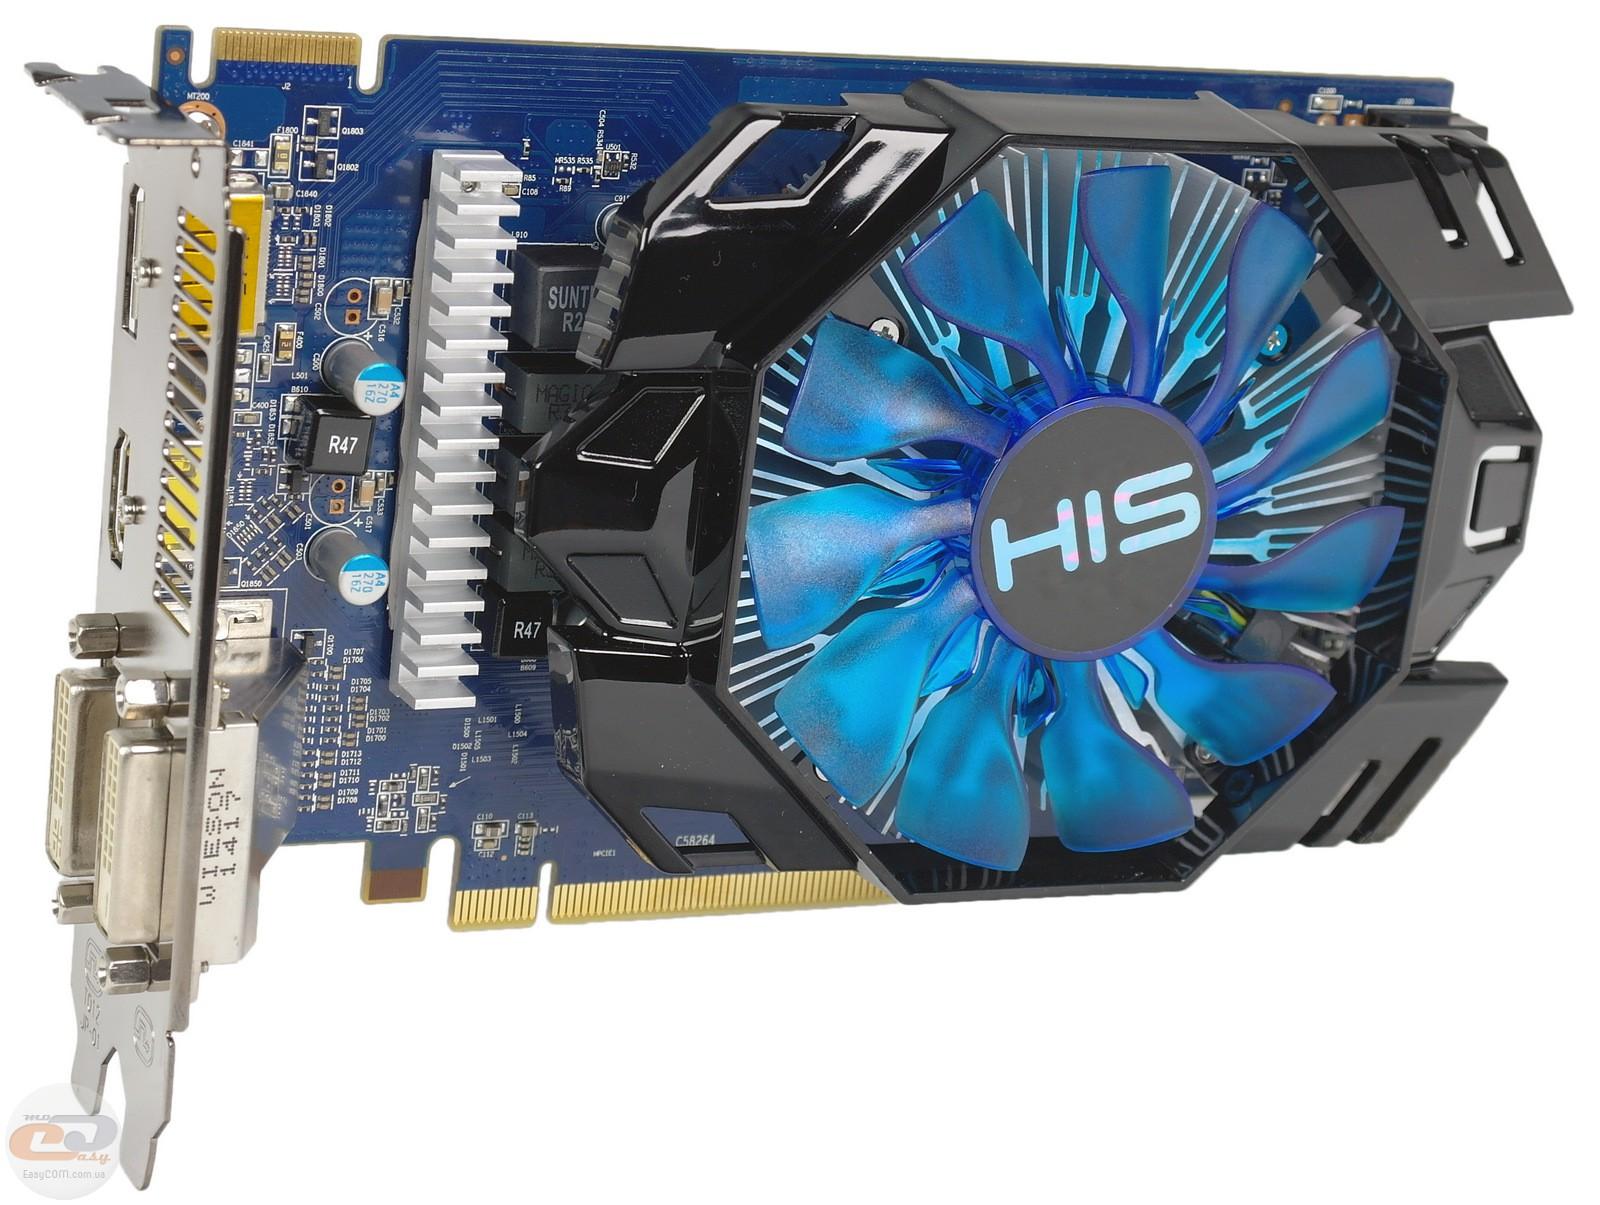 Radeon r7 260х: MSI AMD Radeon R7 26 x Обзор, Тест в 9 ...: http://joke24x.ru/442/94.html